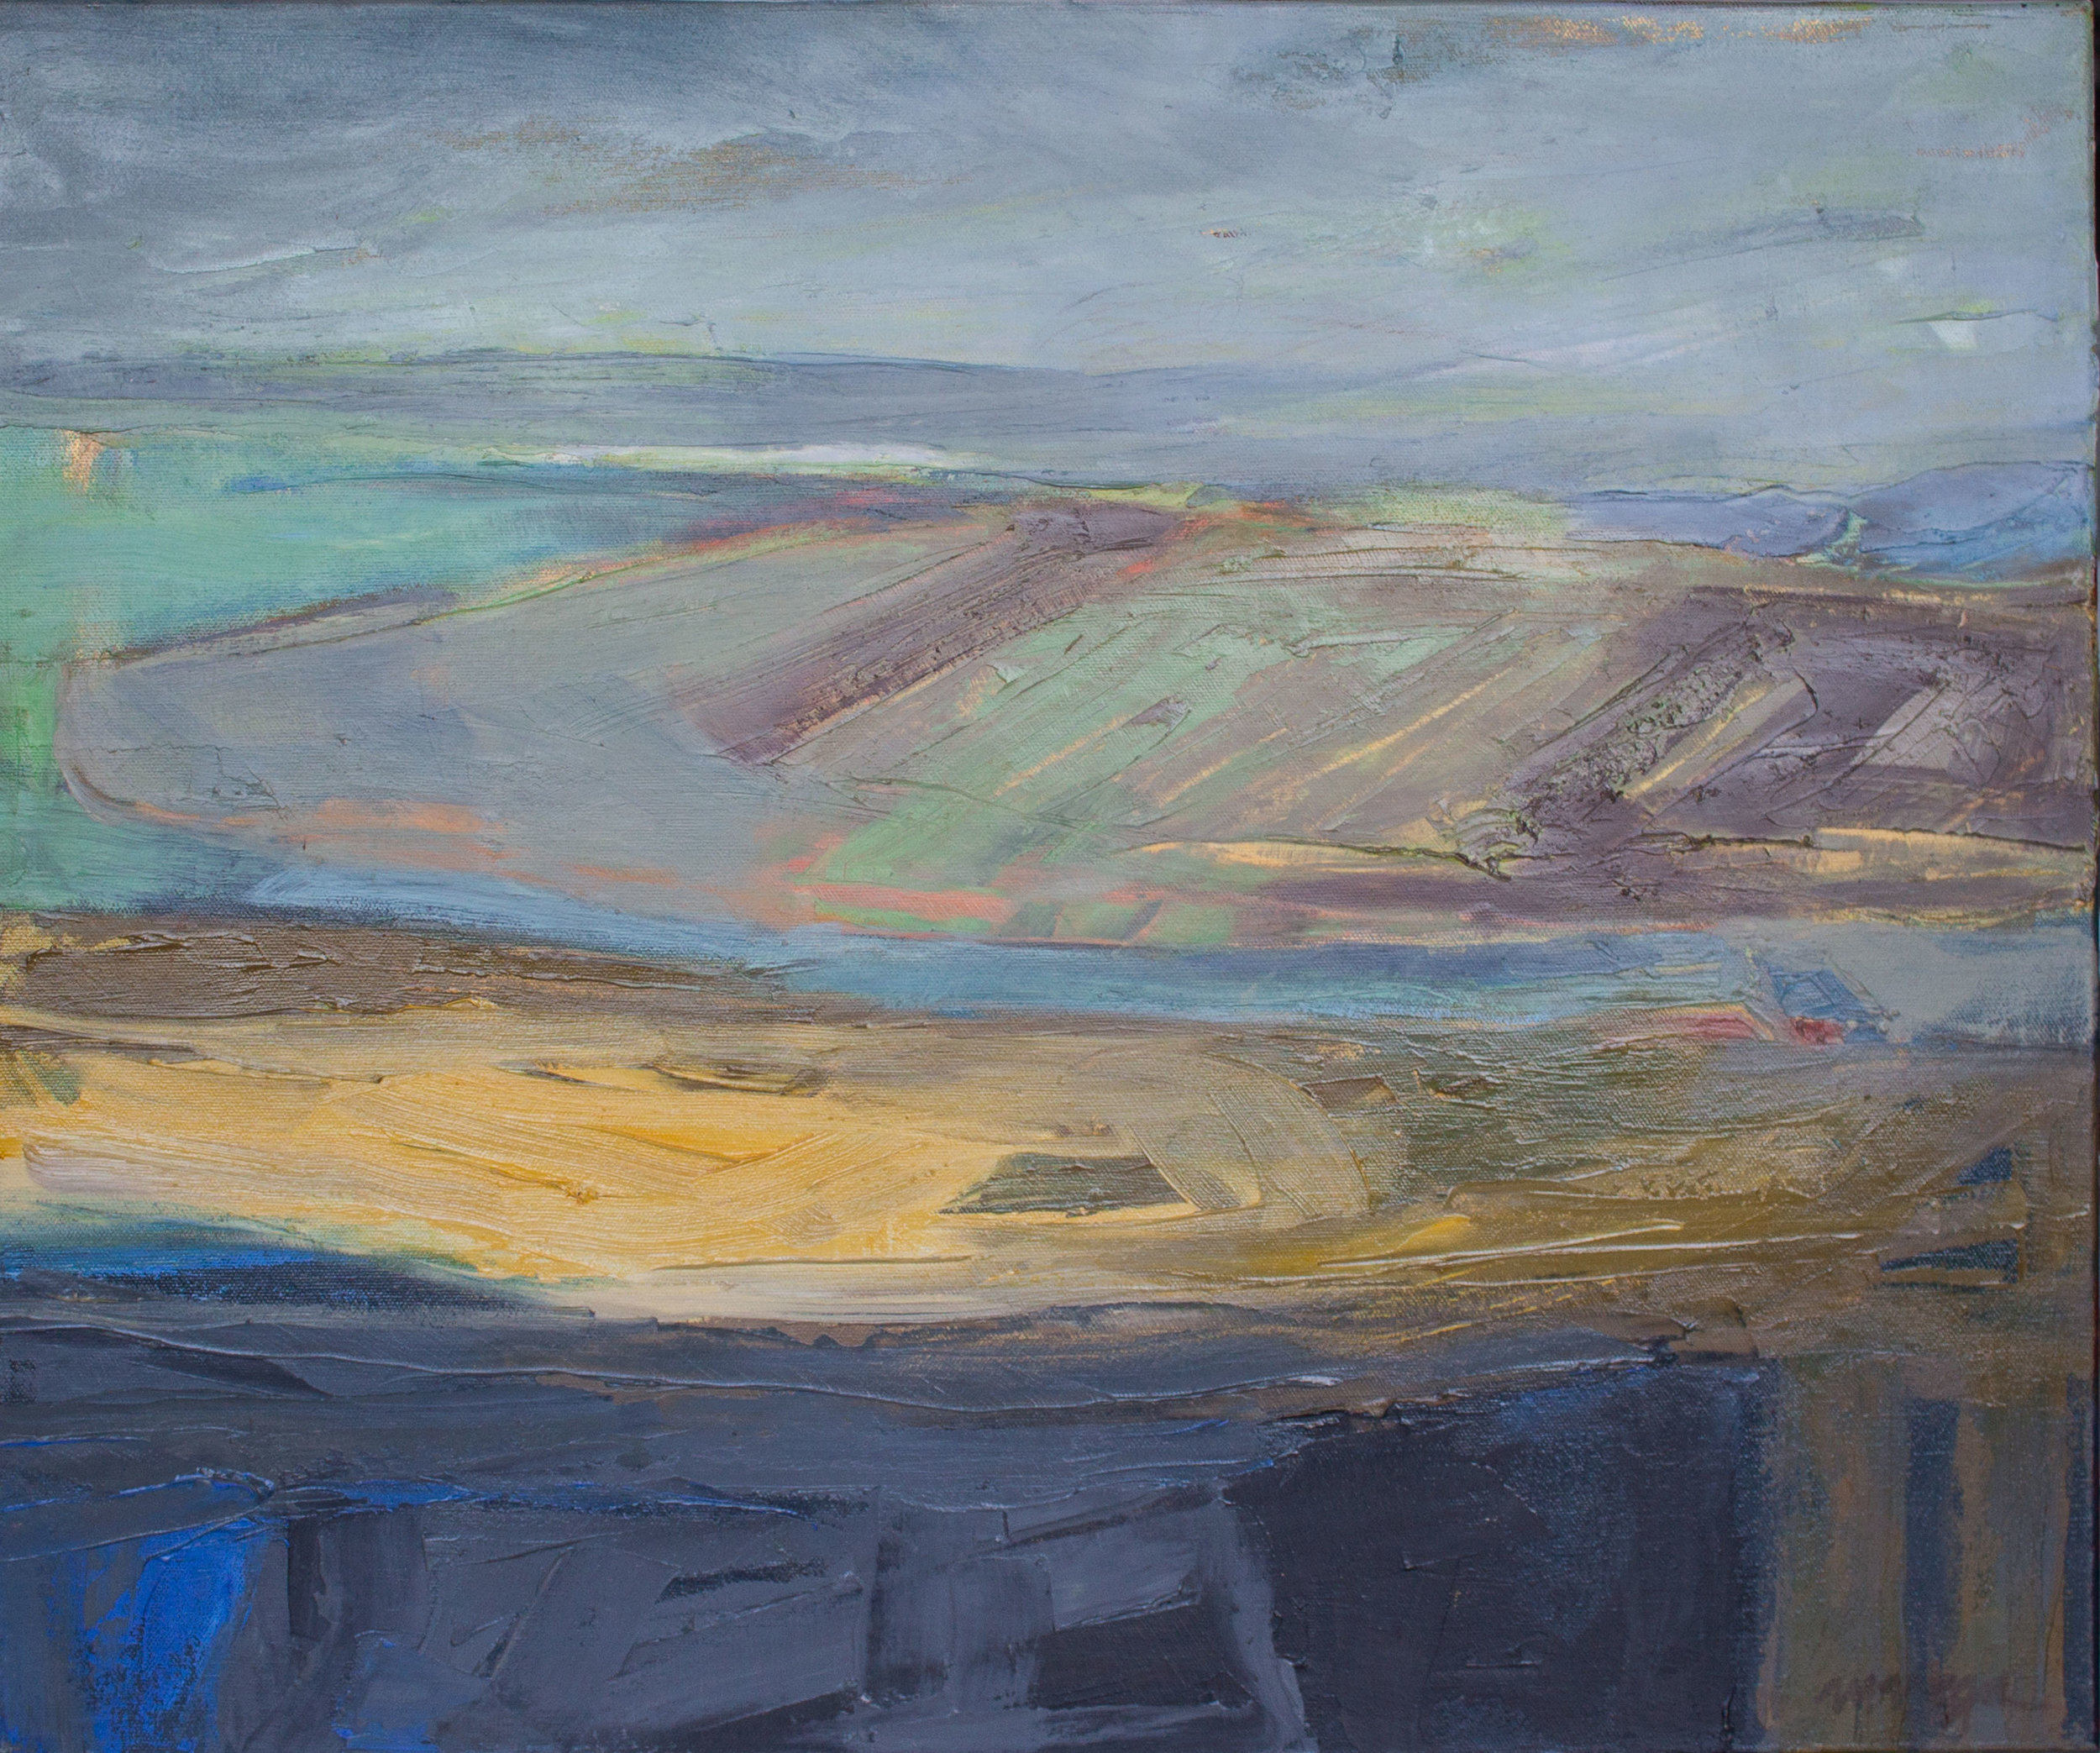 """ Landscape with Architectural Elements,"" Margaret Vega"